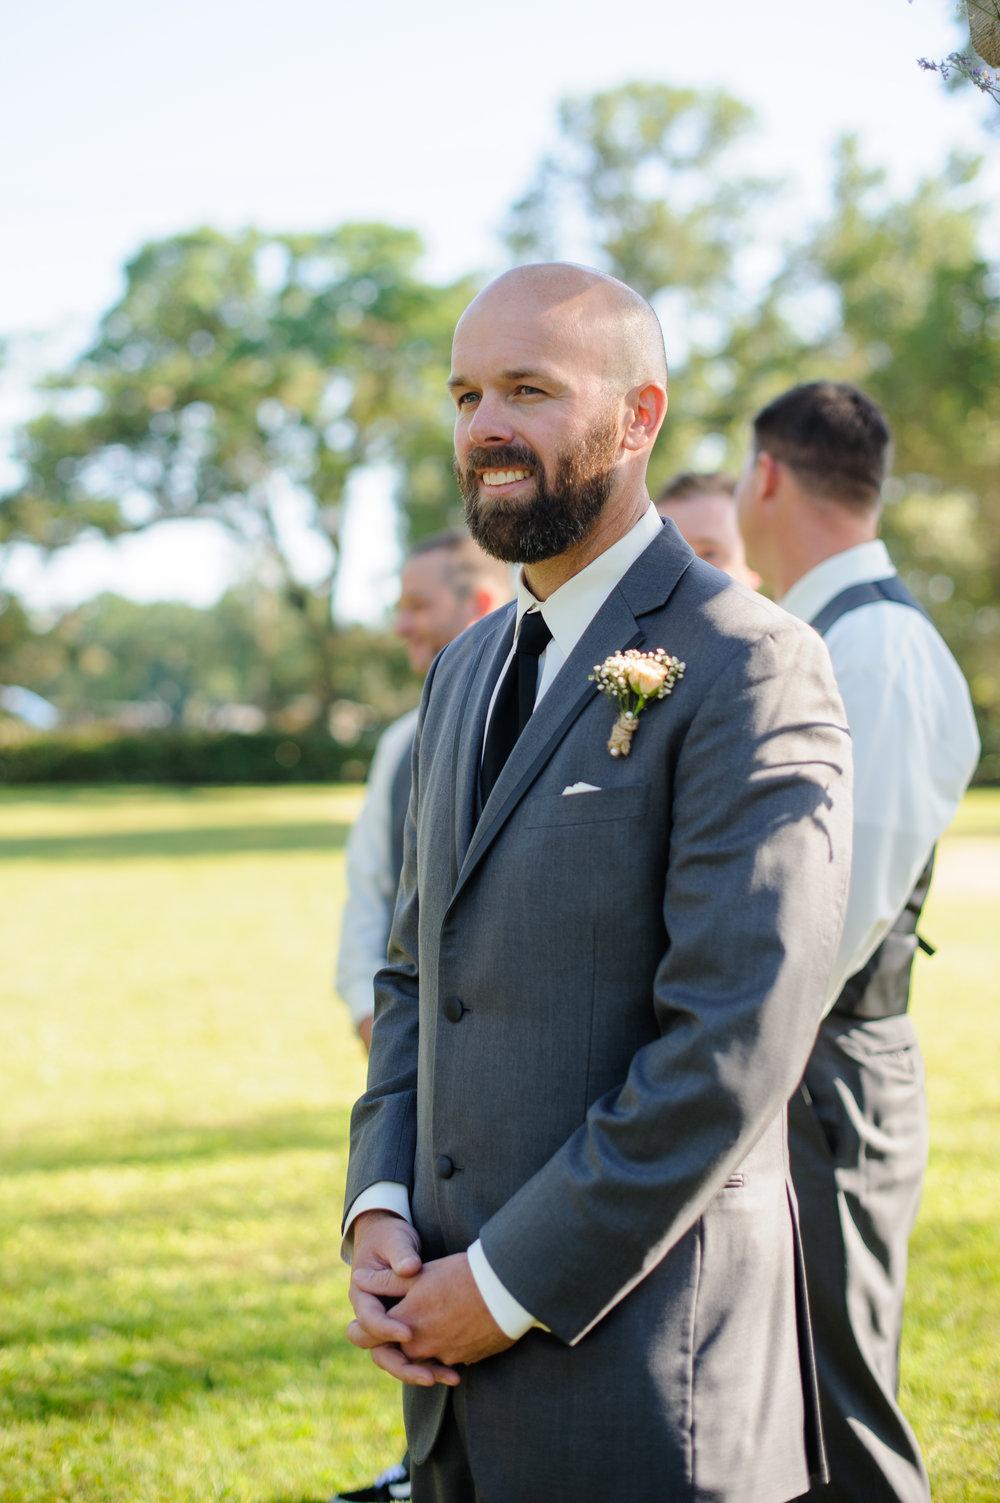 lindsey-alex-013-backyard-sacramento-wedding-photographer-katherine-nicole-photography.JPG